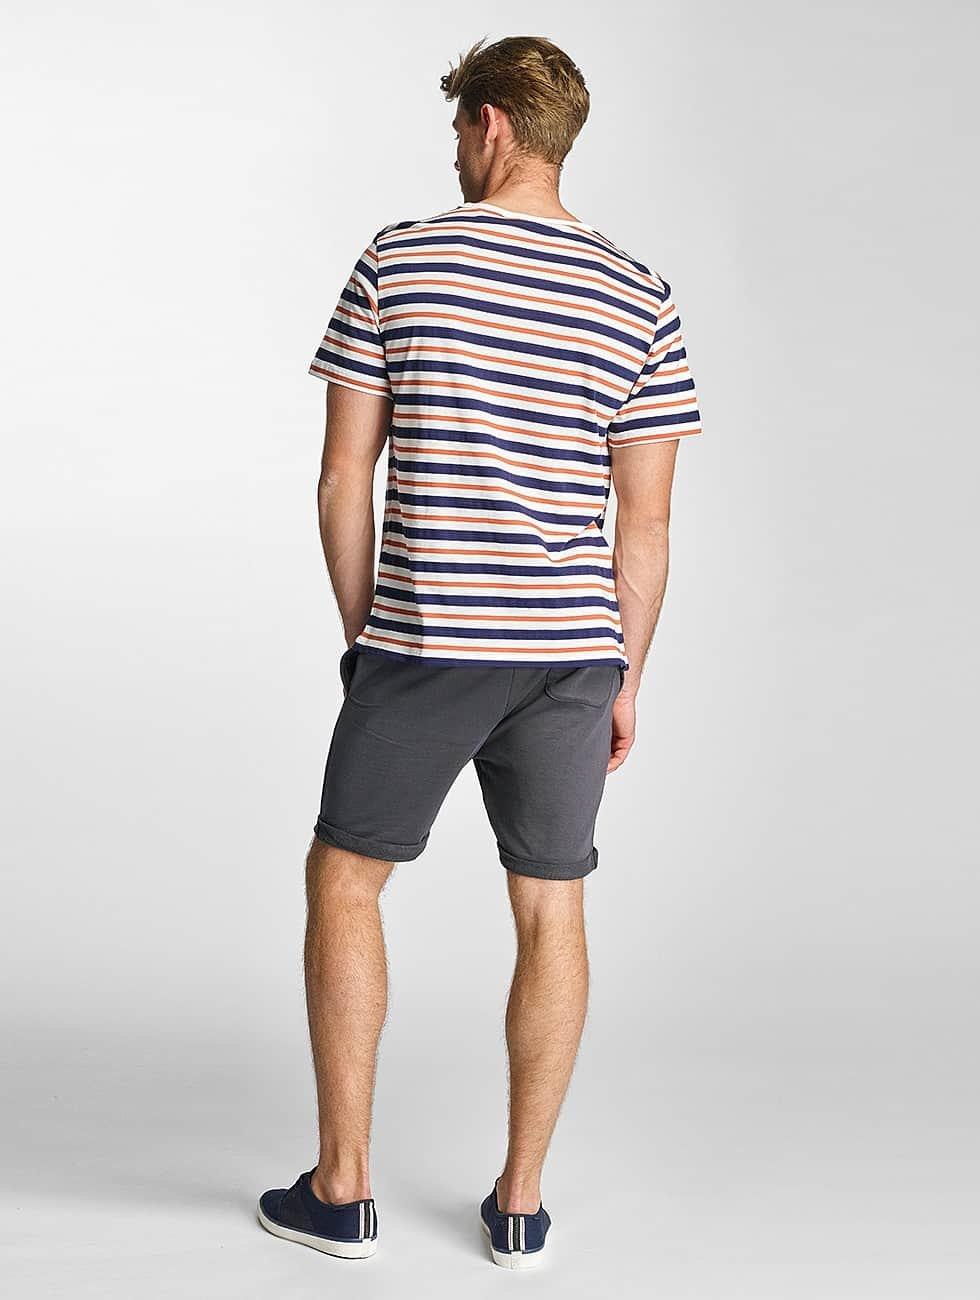 Lee T-Shirt Stripe white